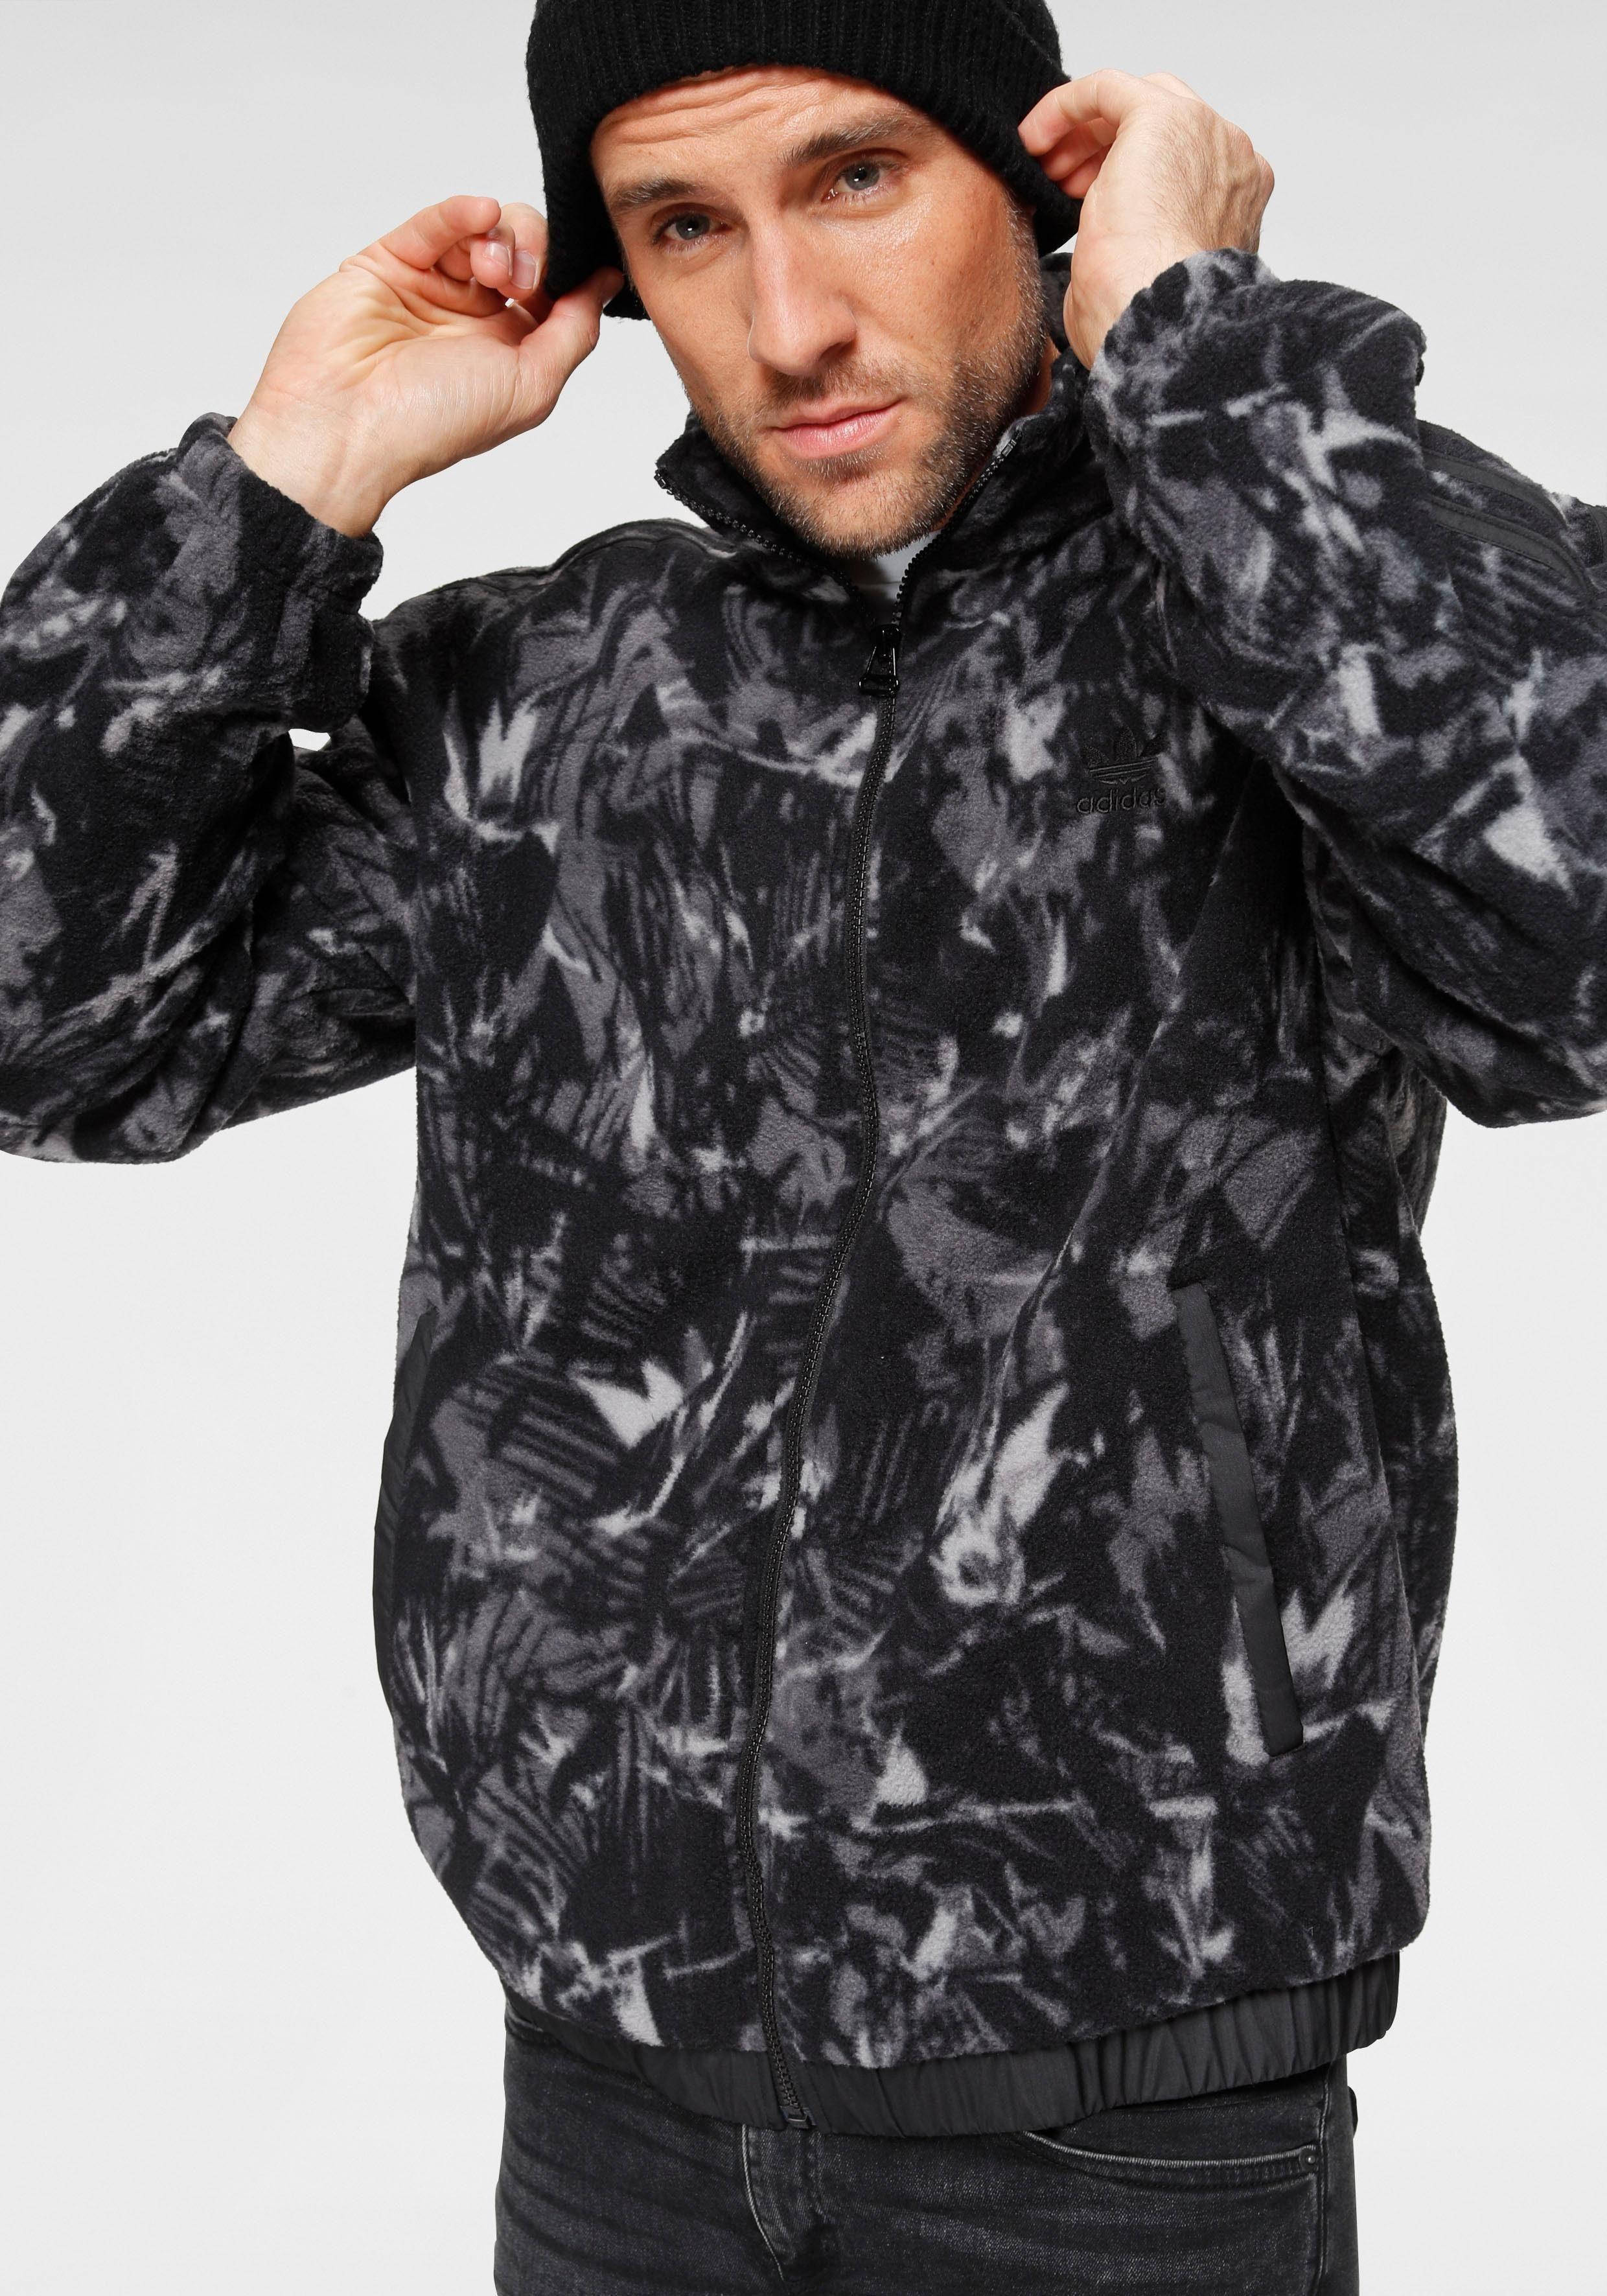 adidas Originals Fleecejacke POLAR FLEECE TOP   Bekleidung > Jacken > Fleecejacken   Adidas Originals